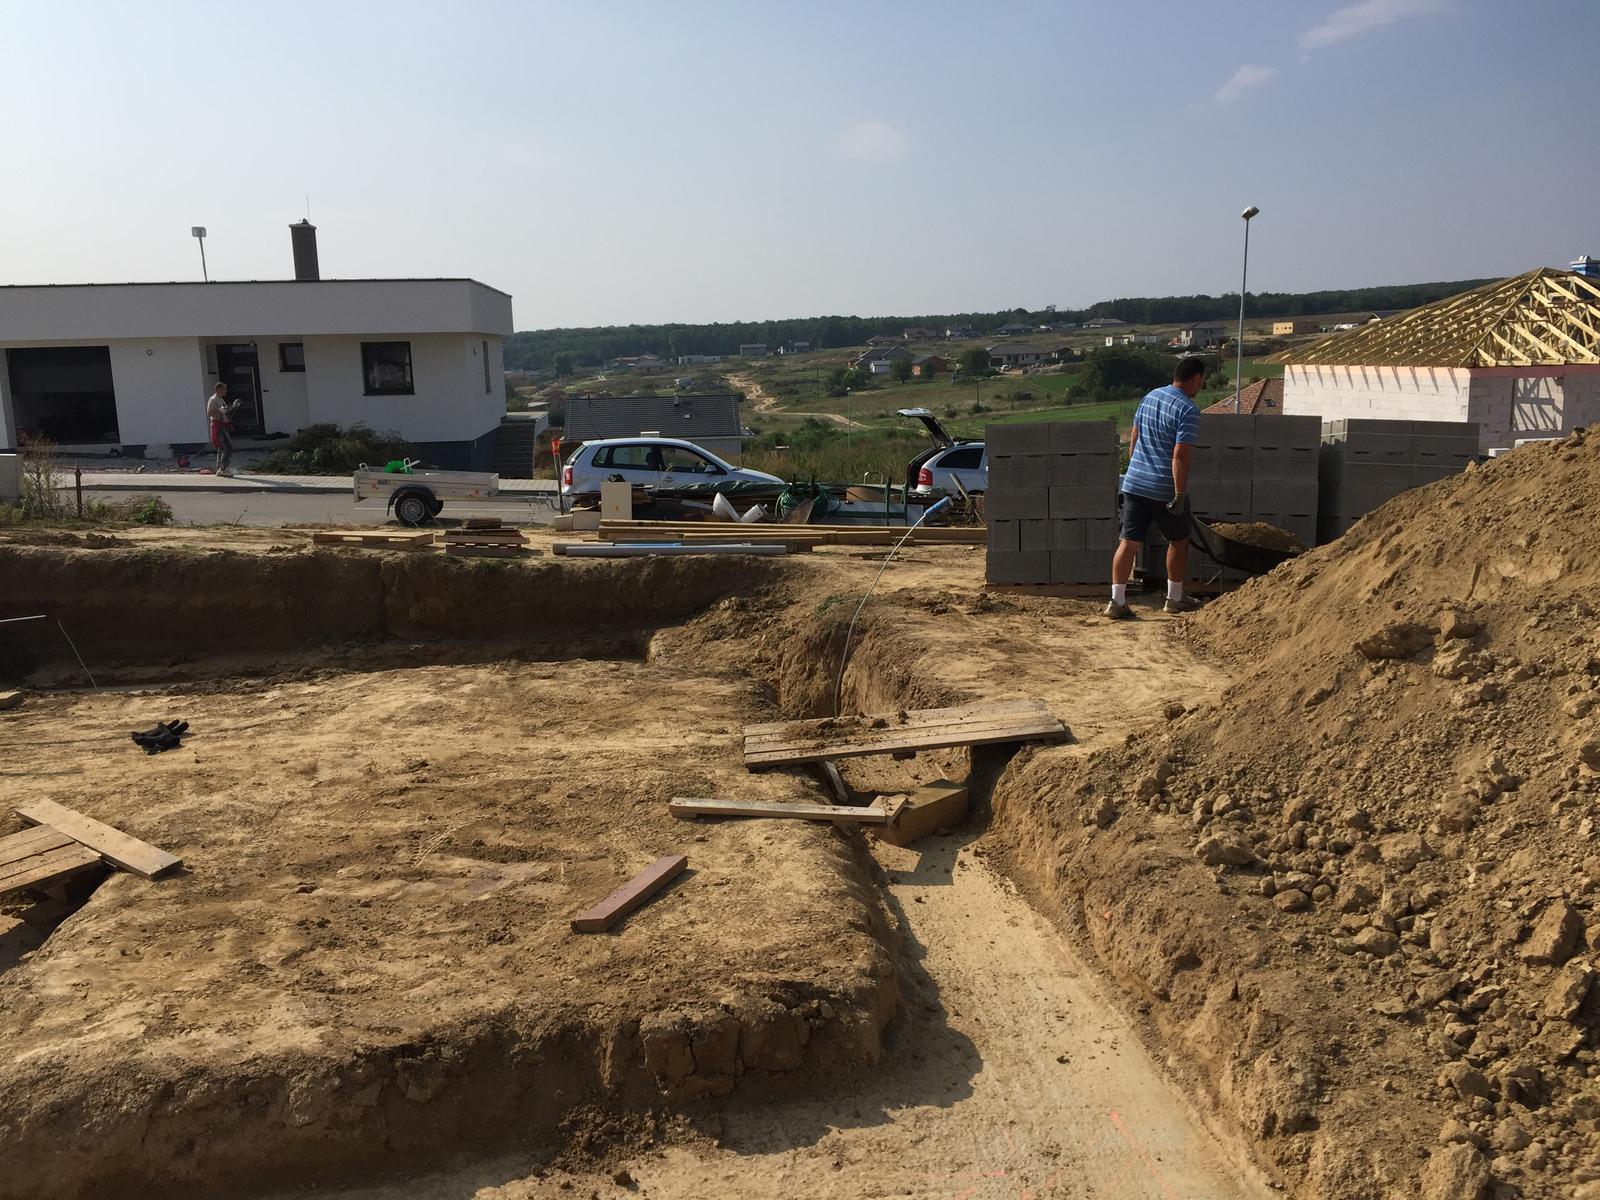 Srnka v Hájiku - 7.9.2018 - Dedko a otec makali od 8-00 :)